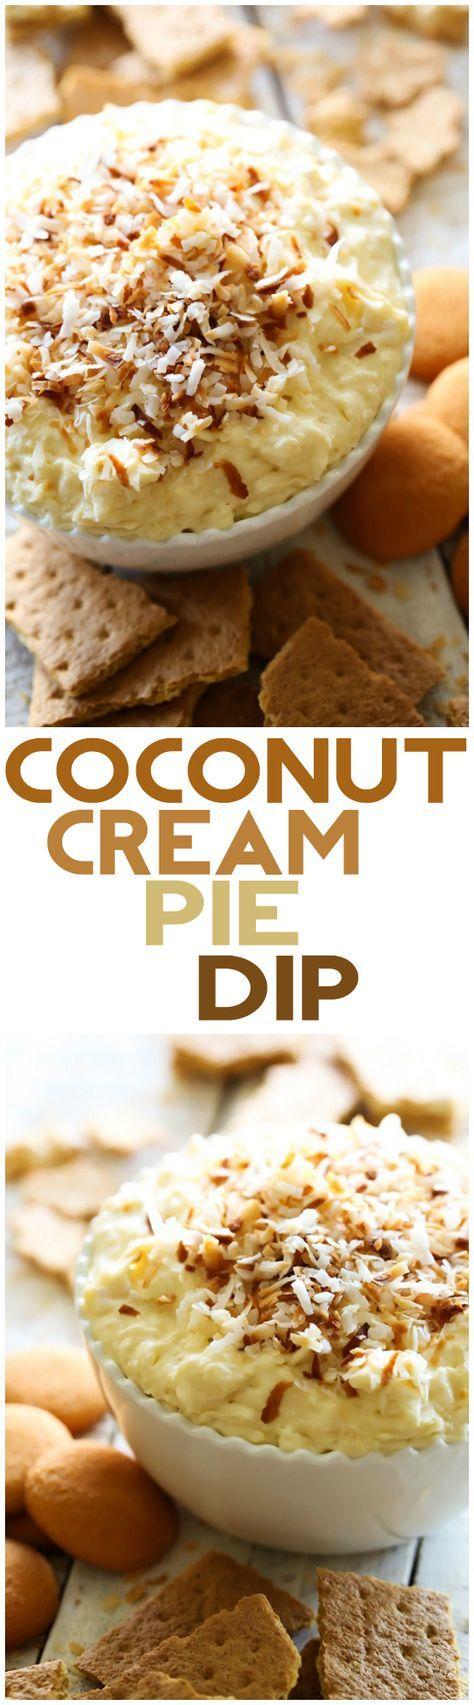 The most delicious coconut cream pie transformed into one unforgettable dessert